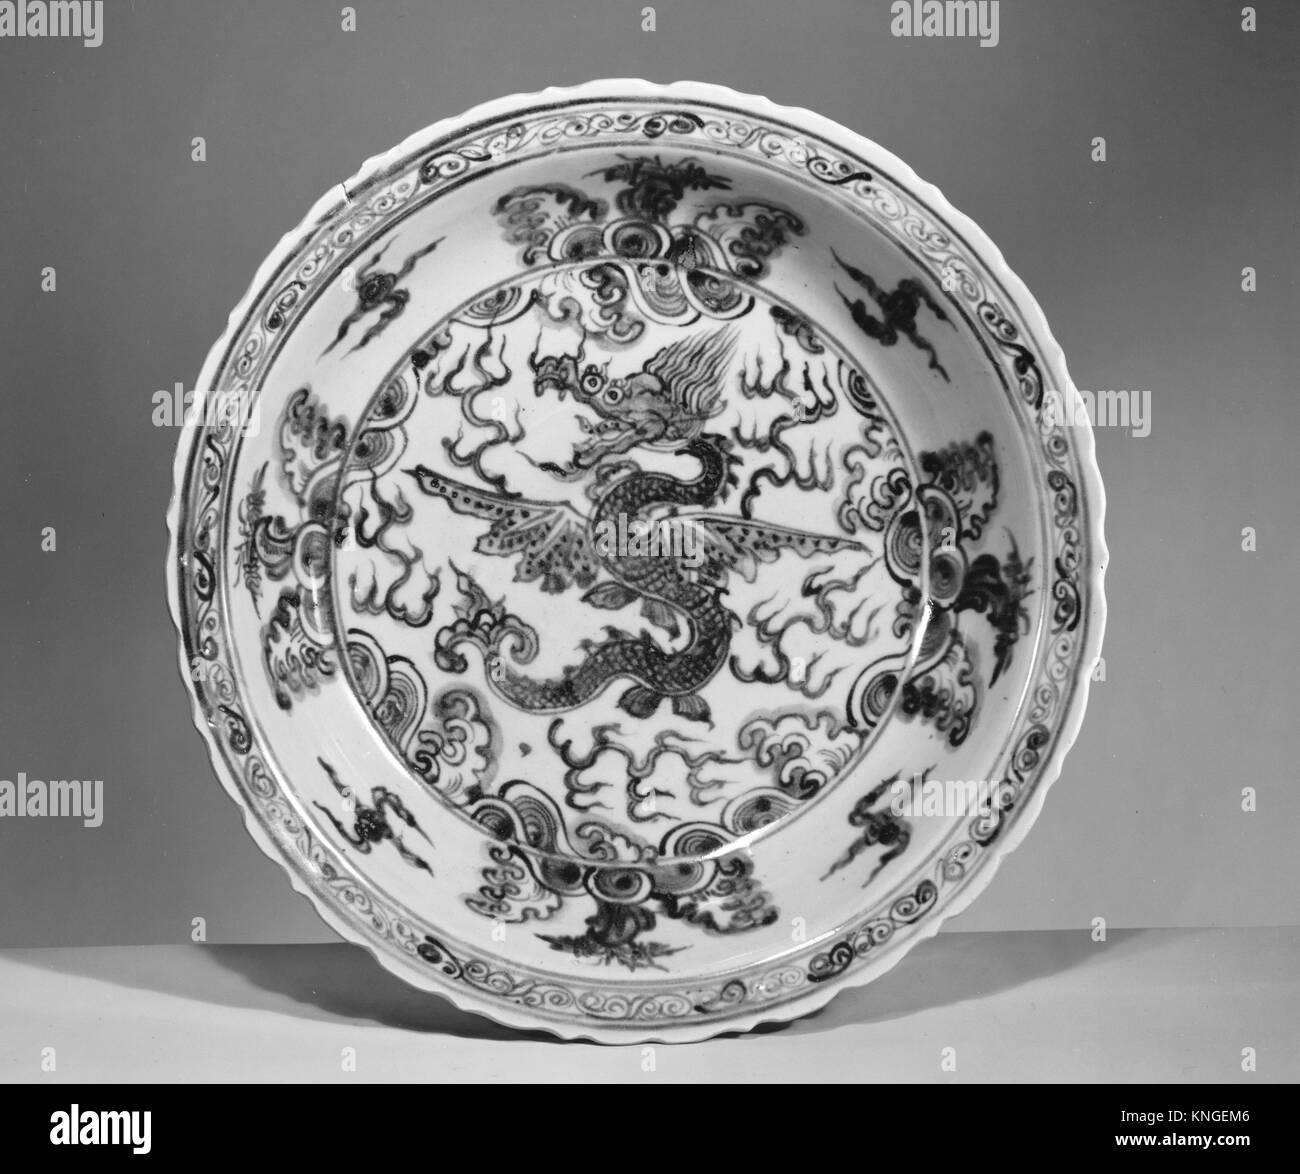 platte zeitraum ming dynastie 1368 1644 datum. Black Bedroom Furniture Sets. Home Design Ideas